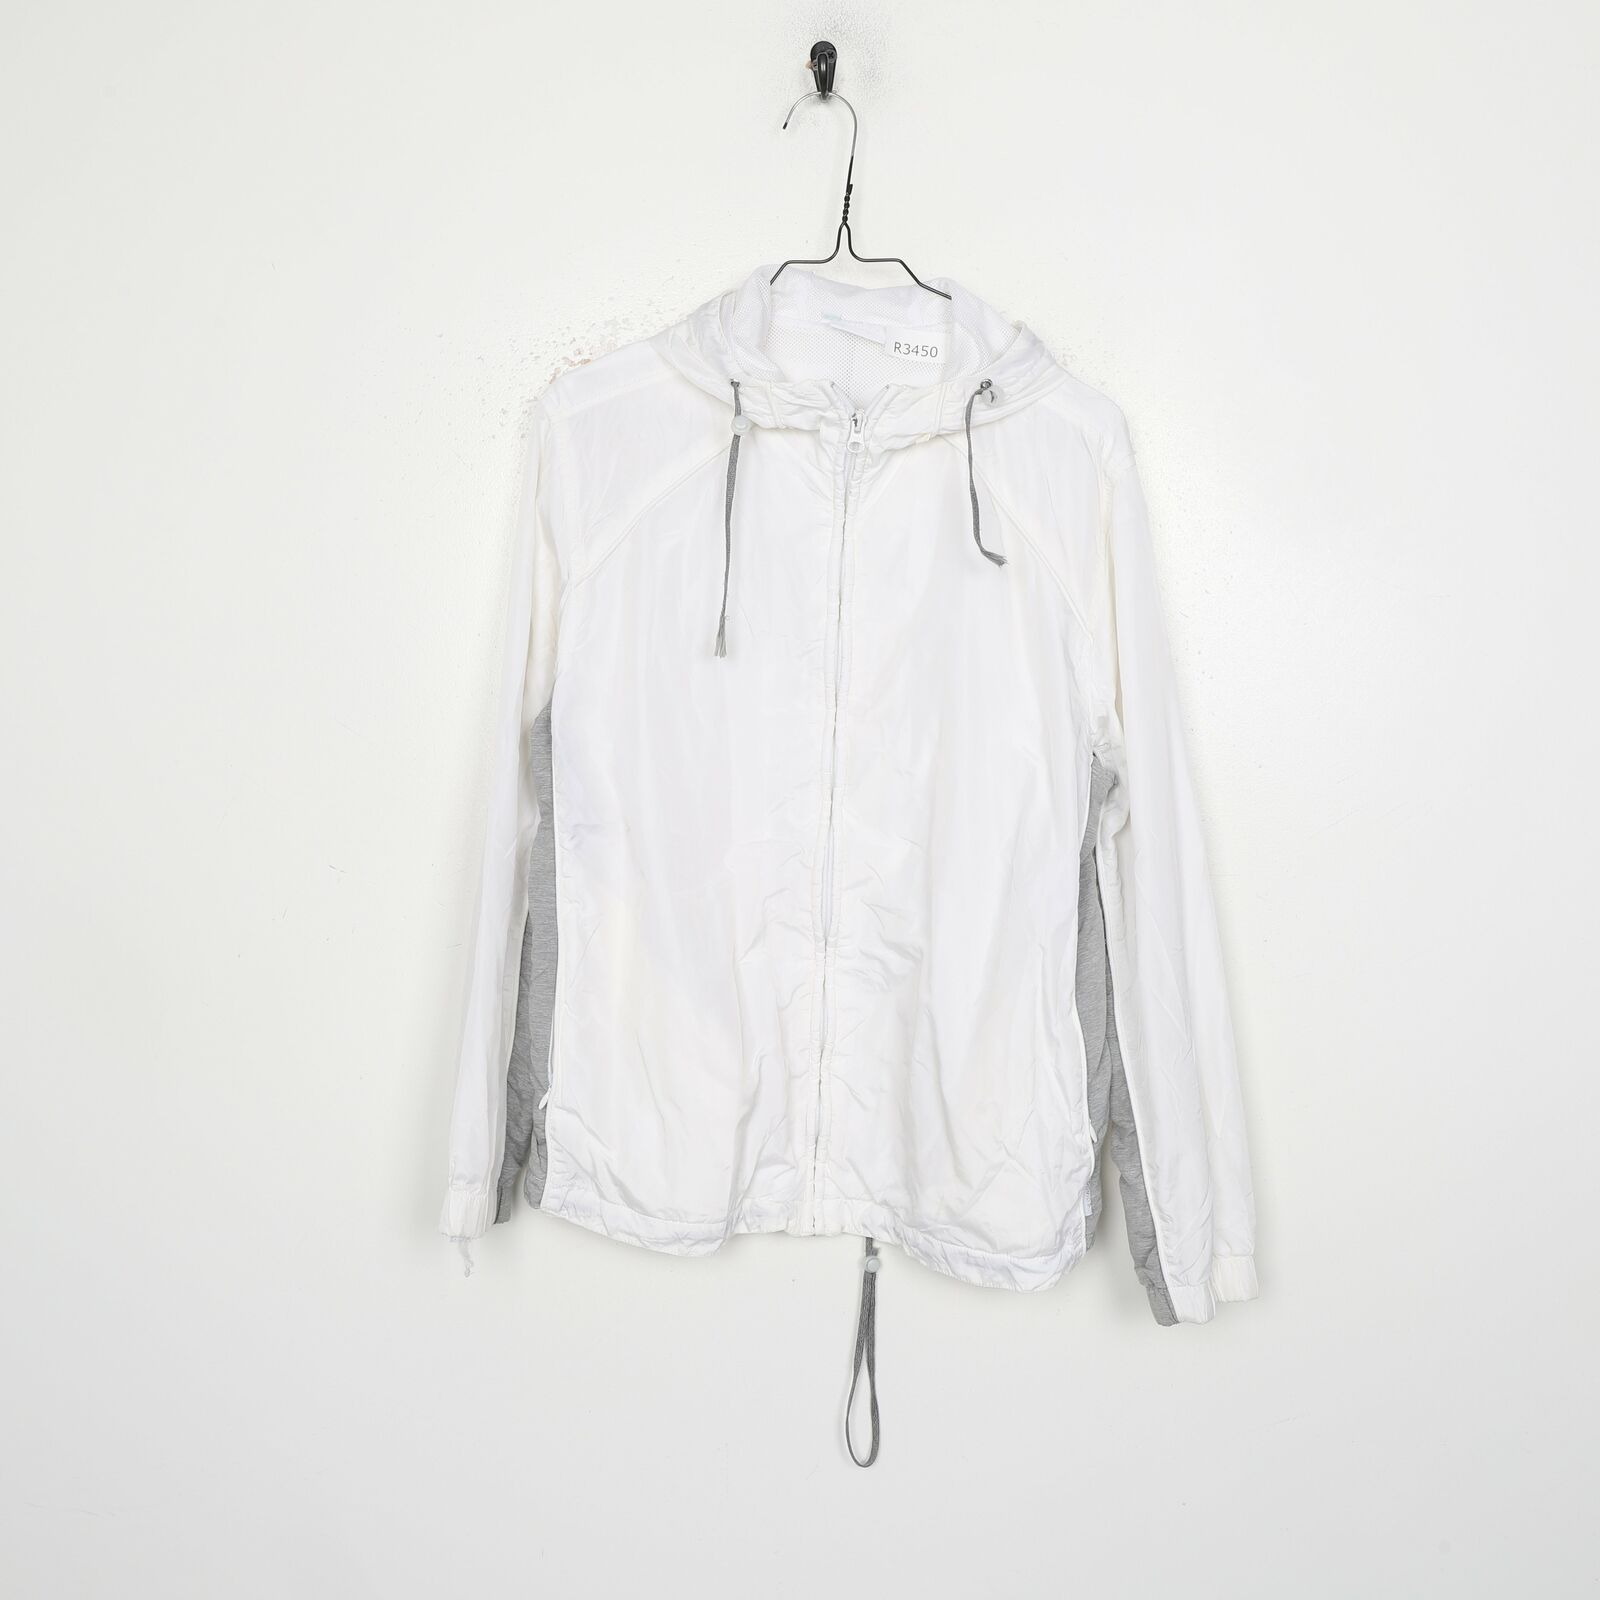 90s DIADORA Hooded Windbreaker Jacket White | Large L